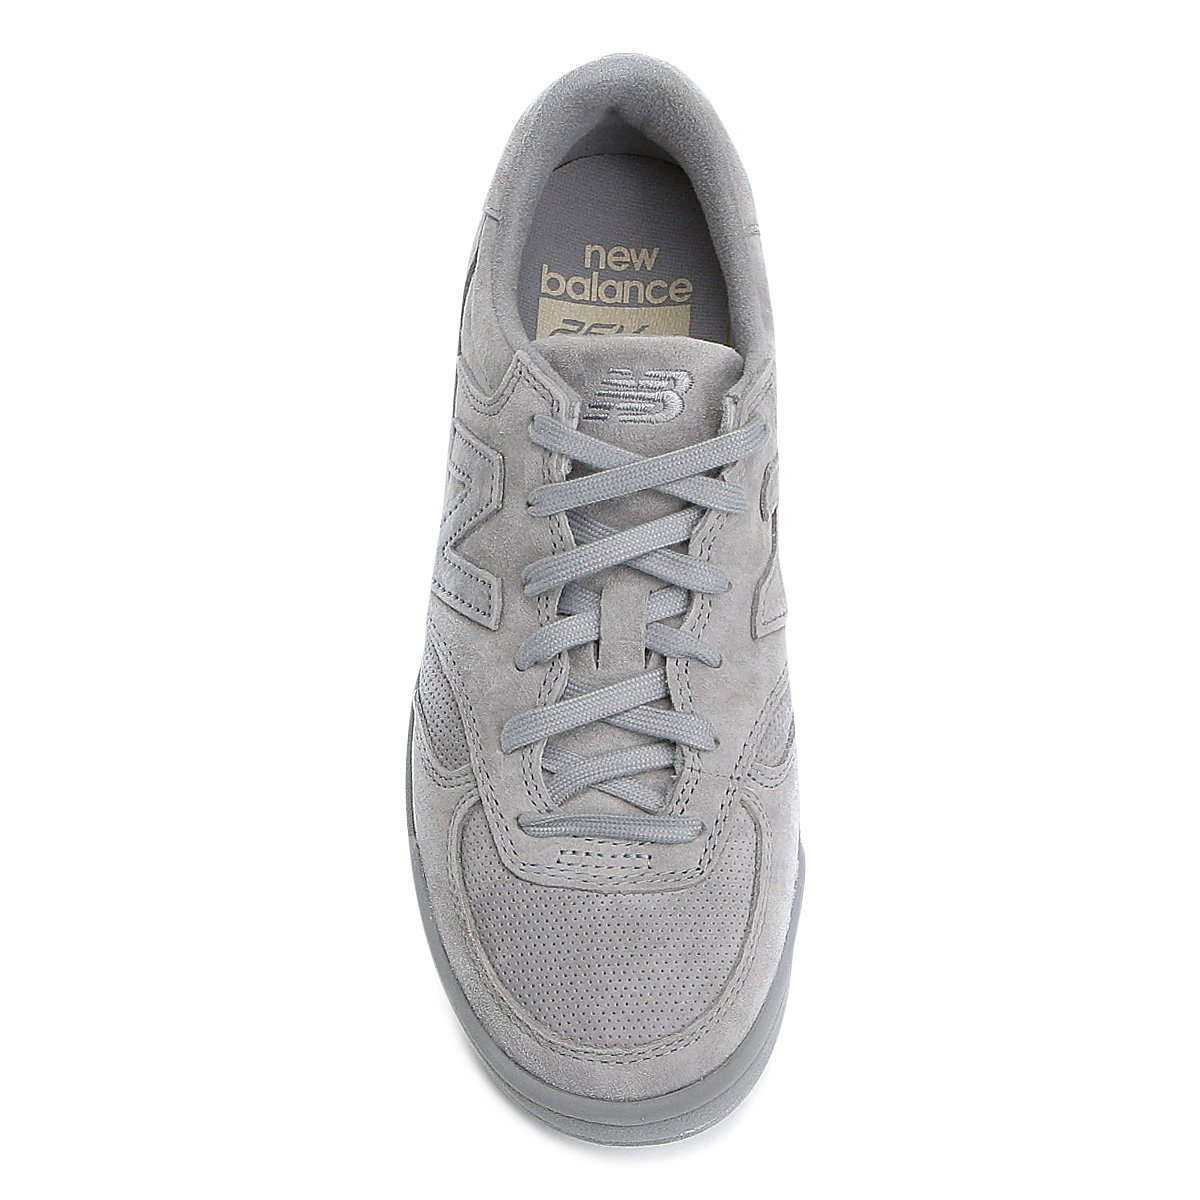 Feminino New Feminino 300 Tênis Mescla 300 Balance Balance Couro New Couro Tênis Mescla Tênis wFnfqpB